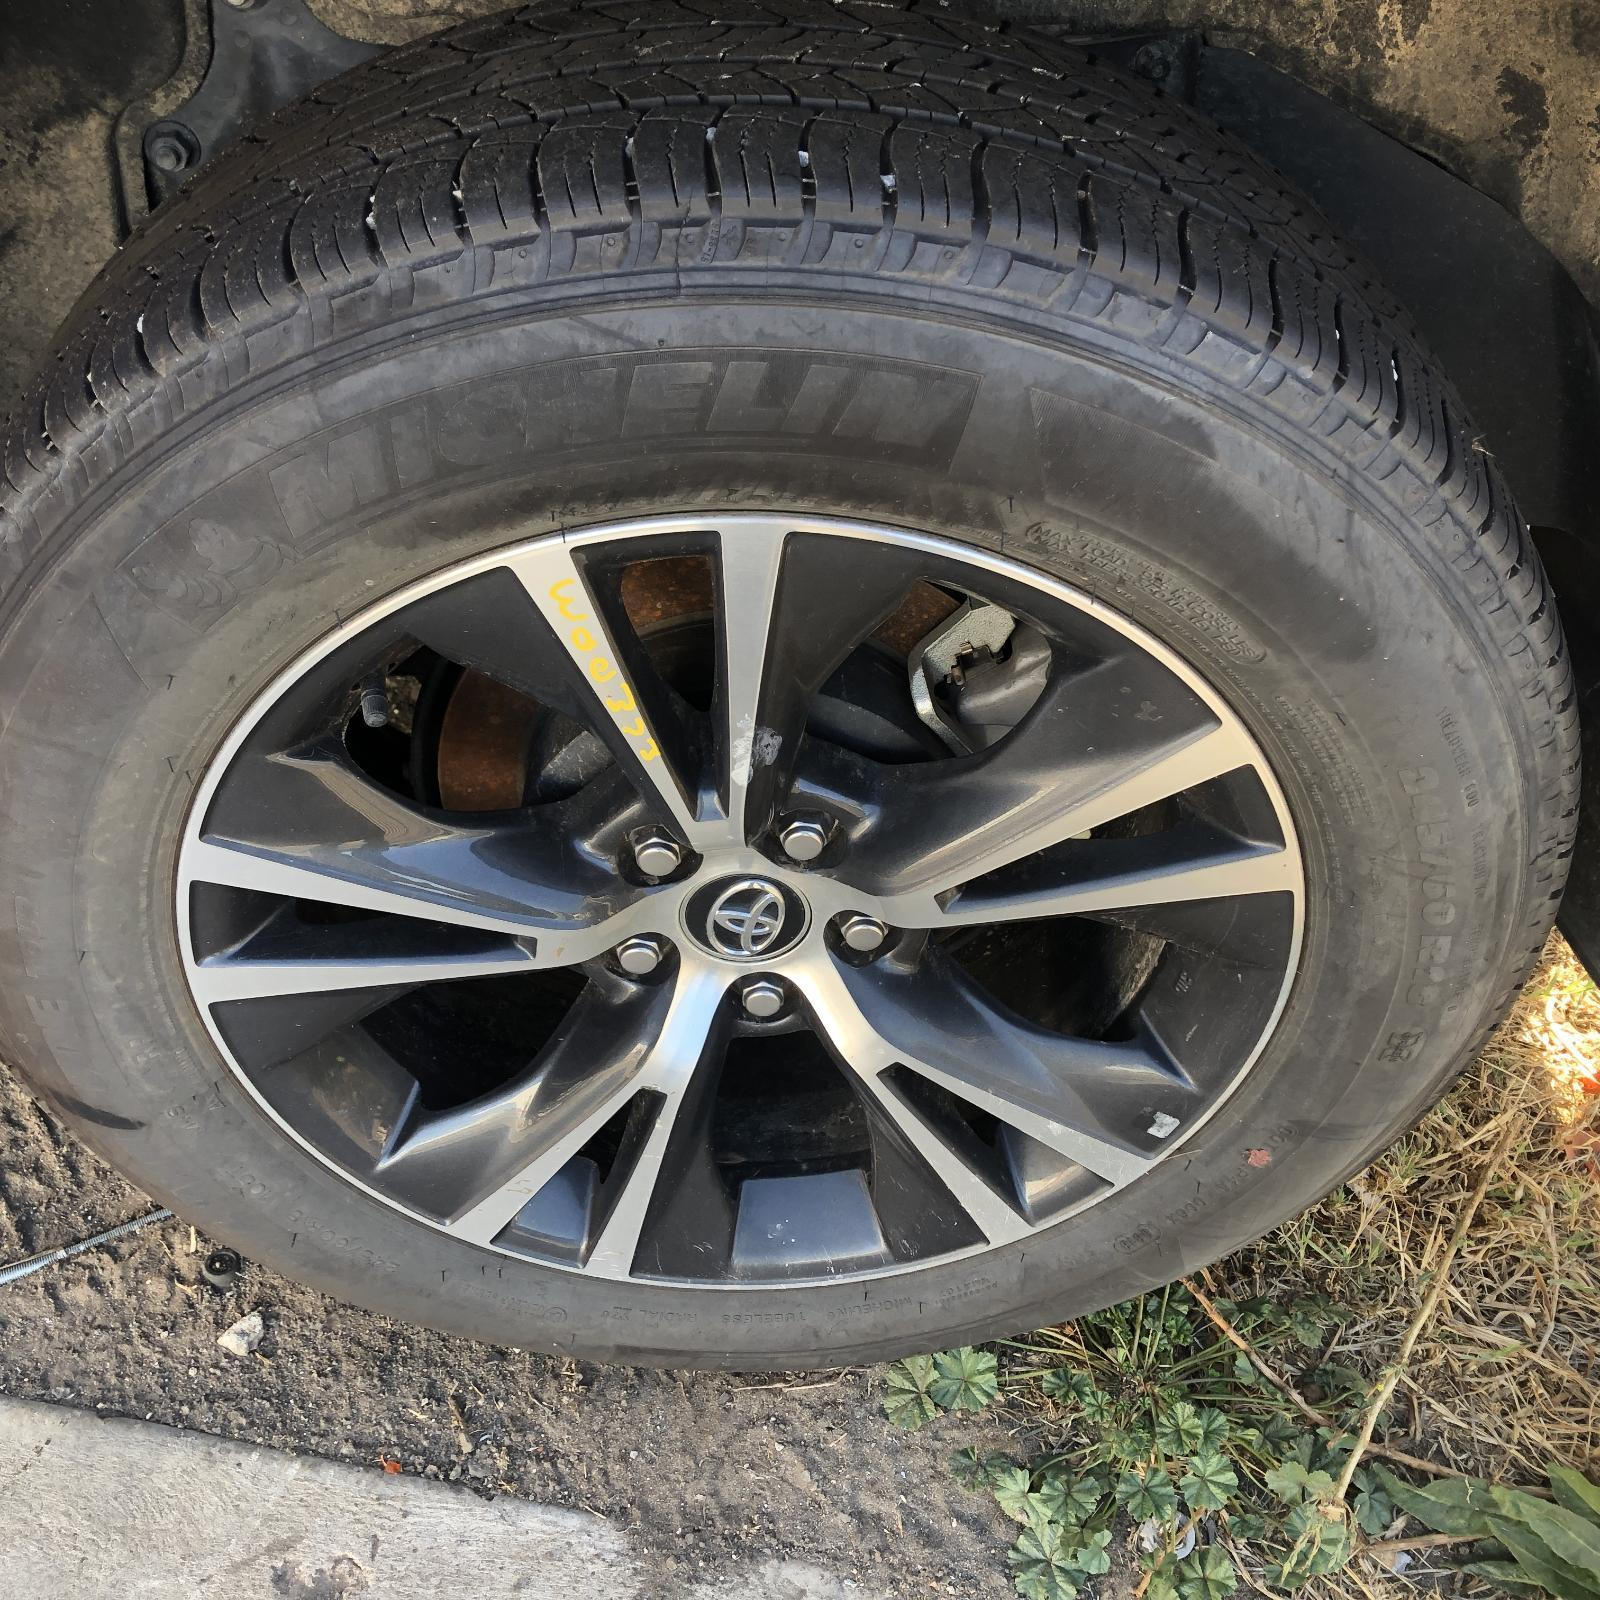 TOYOTA KLUGER, Wheel Mag, FACTORY, 18X7.5IN, GXL, GSU50/GSU55, 11/16-